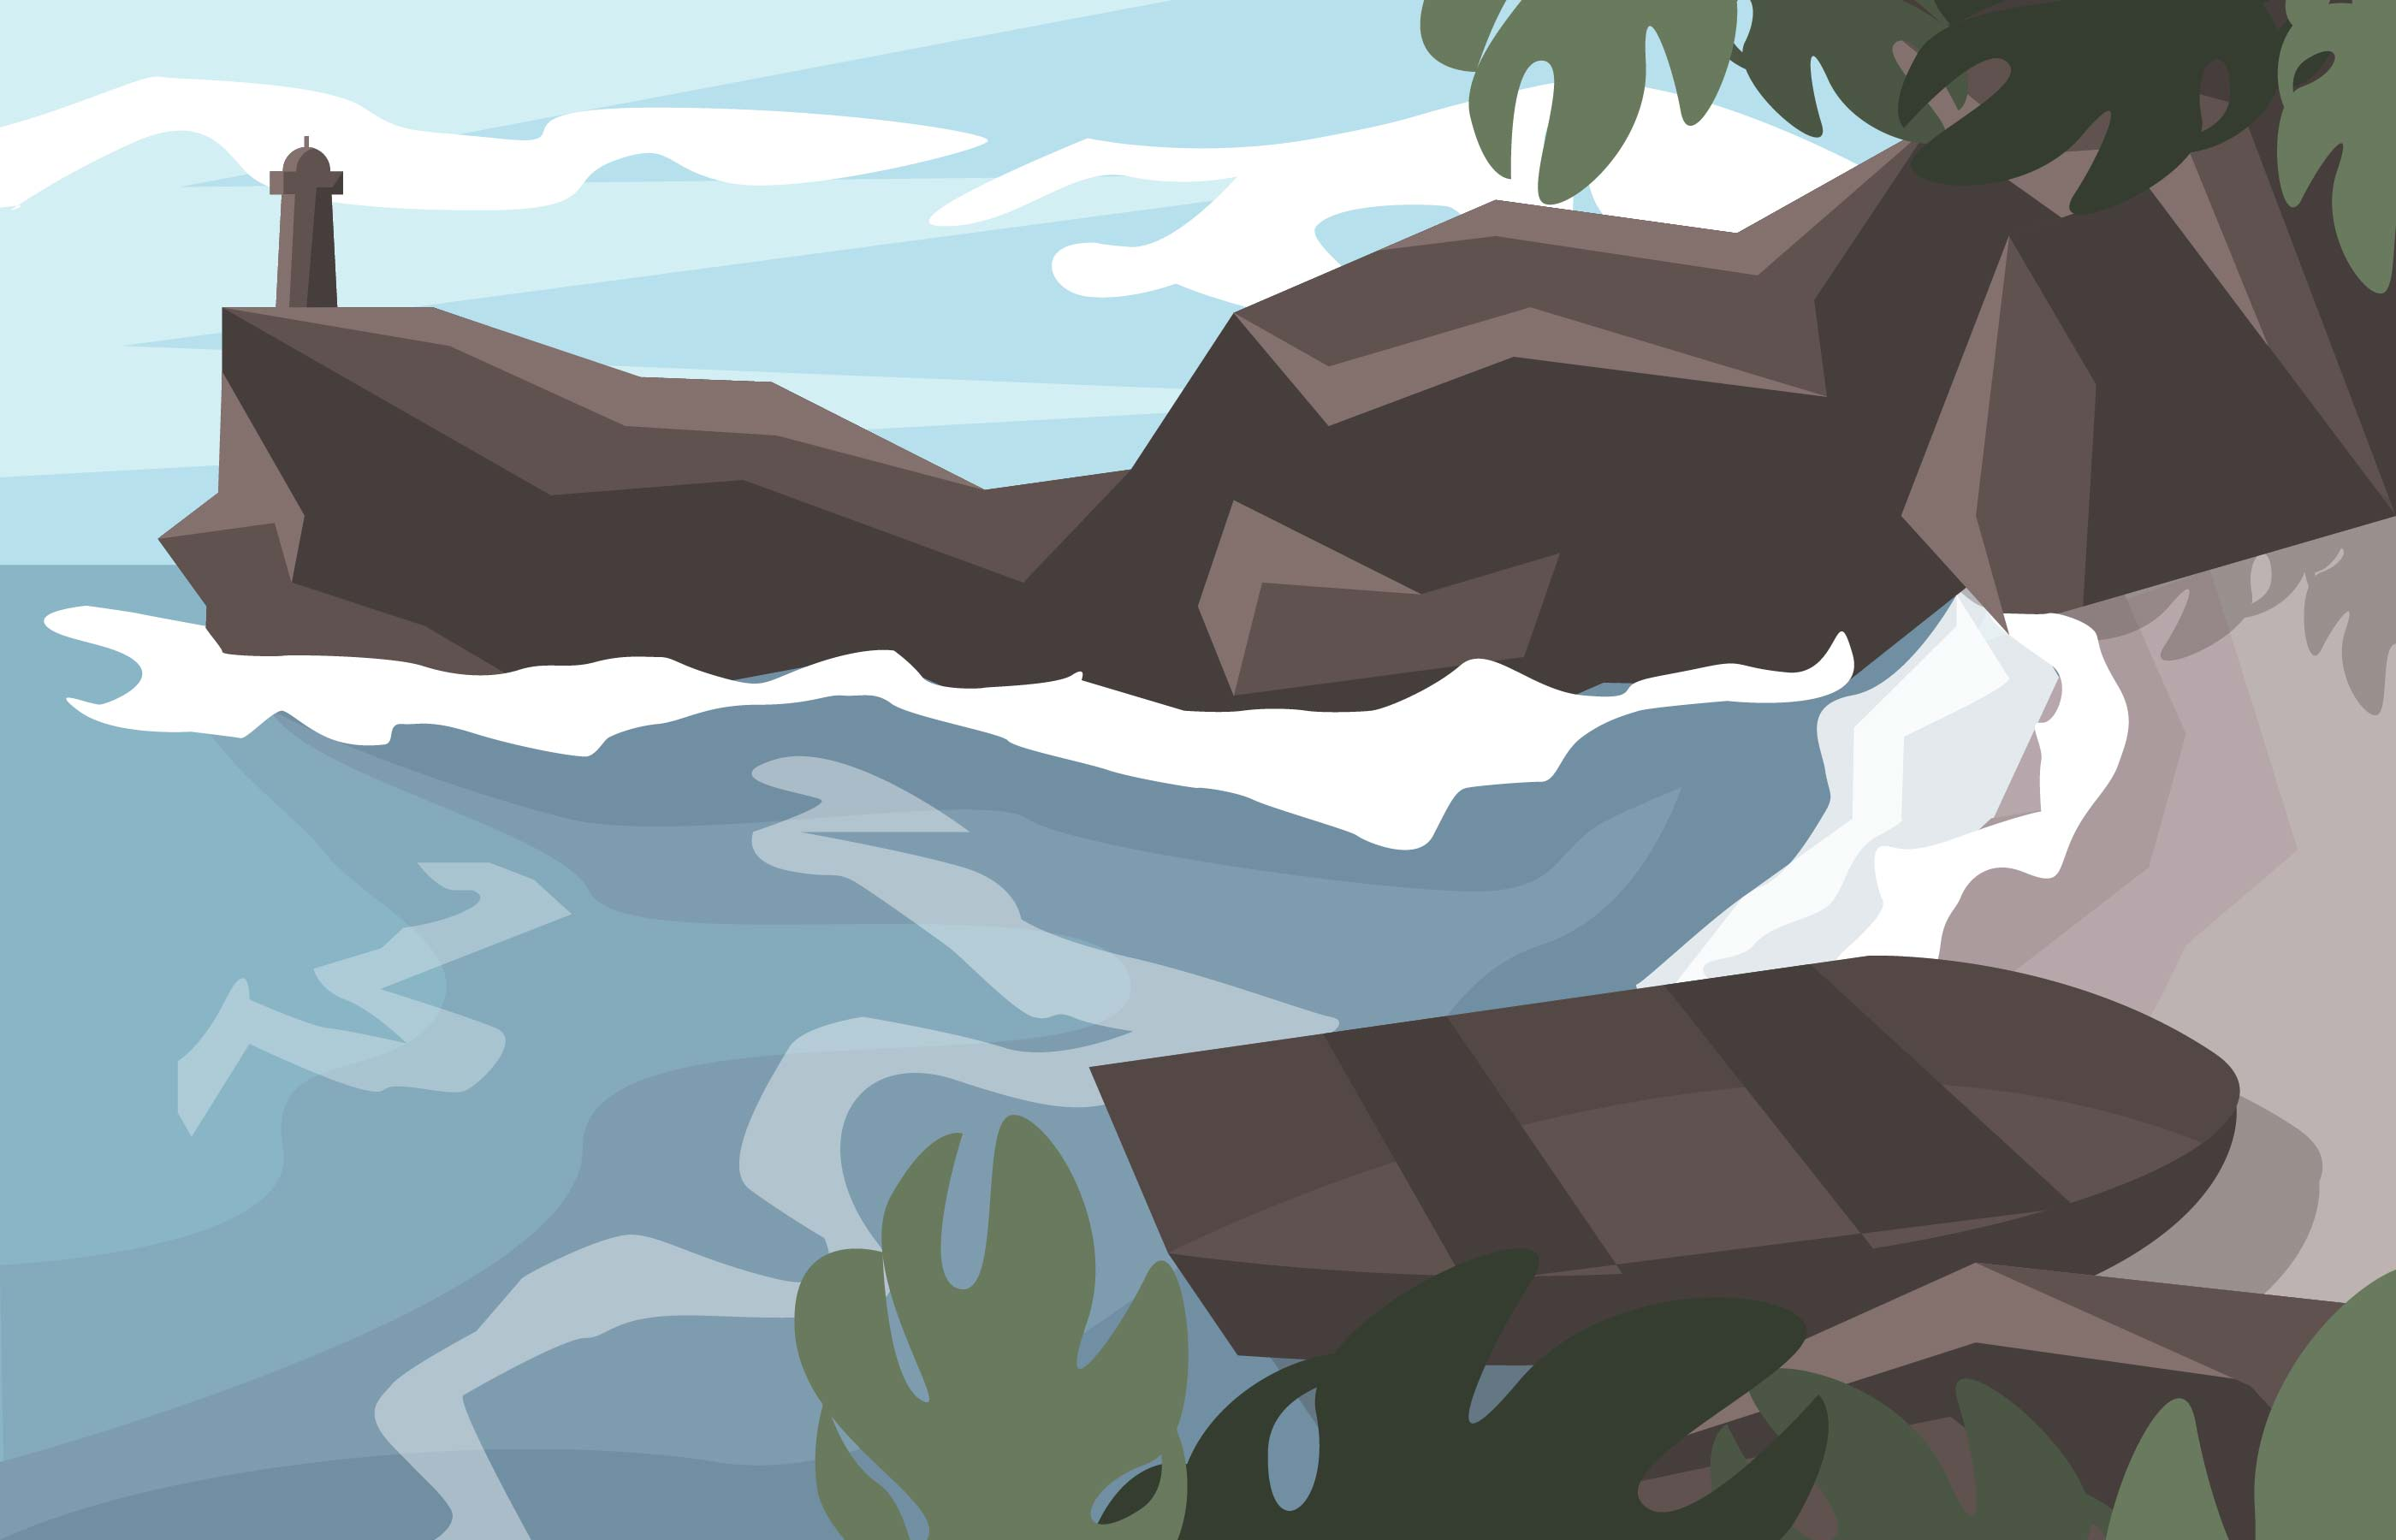 Landscape Illustration Vector Free: Cove Paradise Beach Island Landscape Illustration Vector